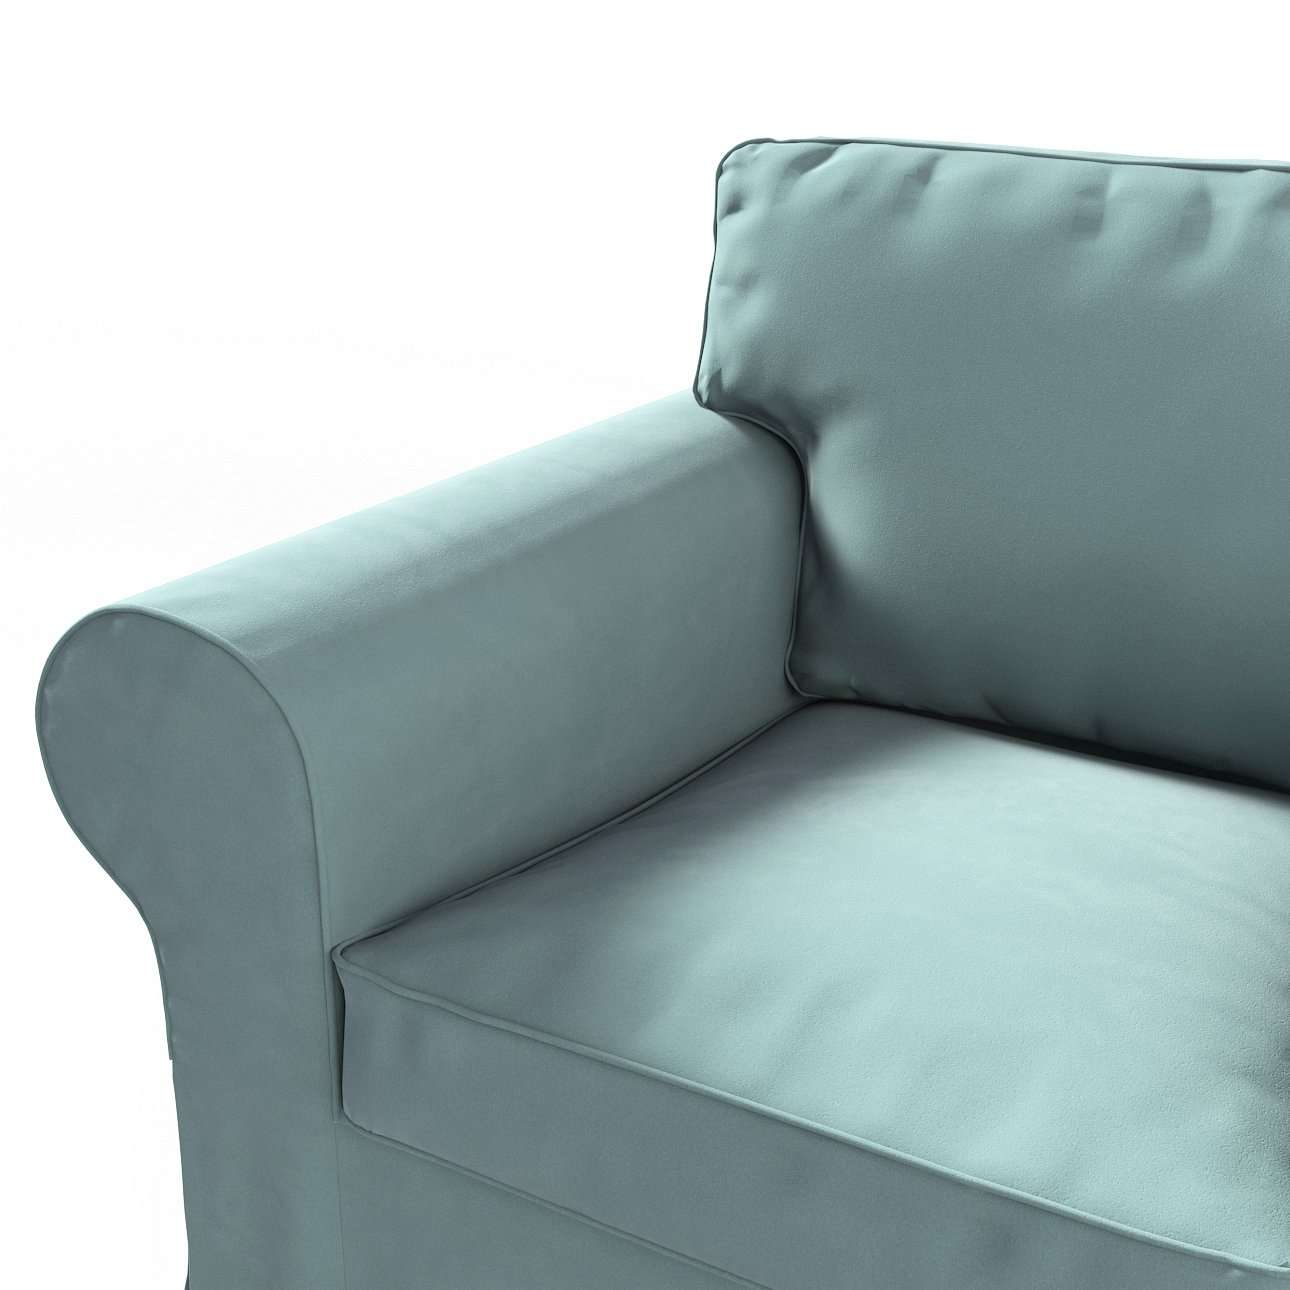 Ektorp lænestol fra kollektionen Velvet, Stof: 704-18